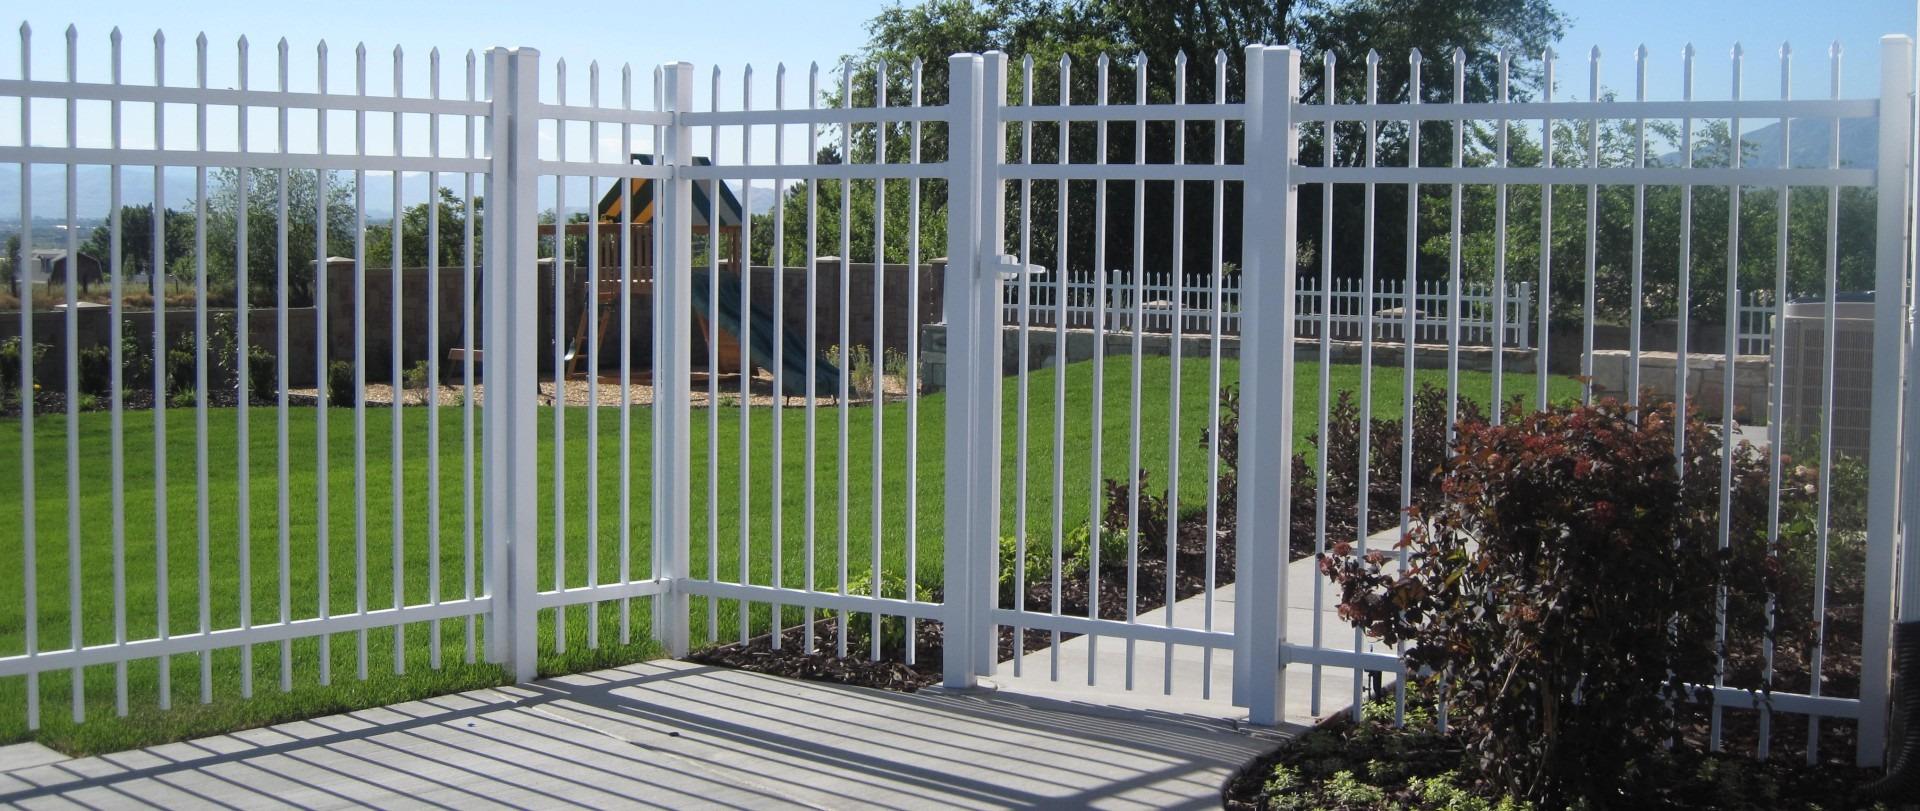 Iron Fences, Railing, Gates & More